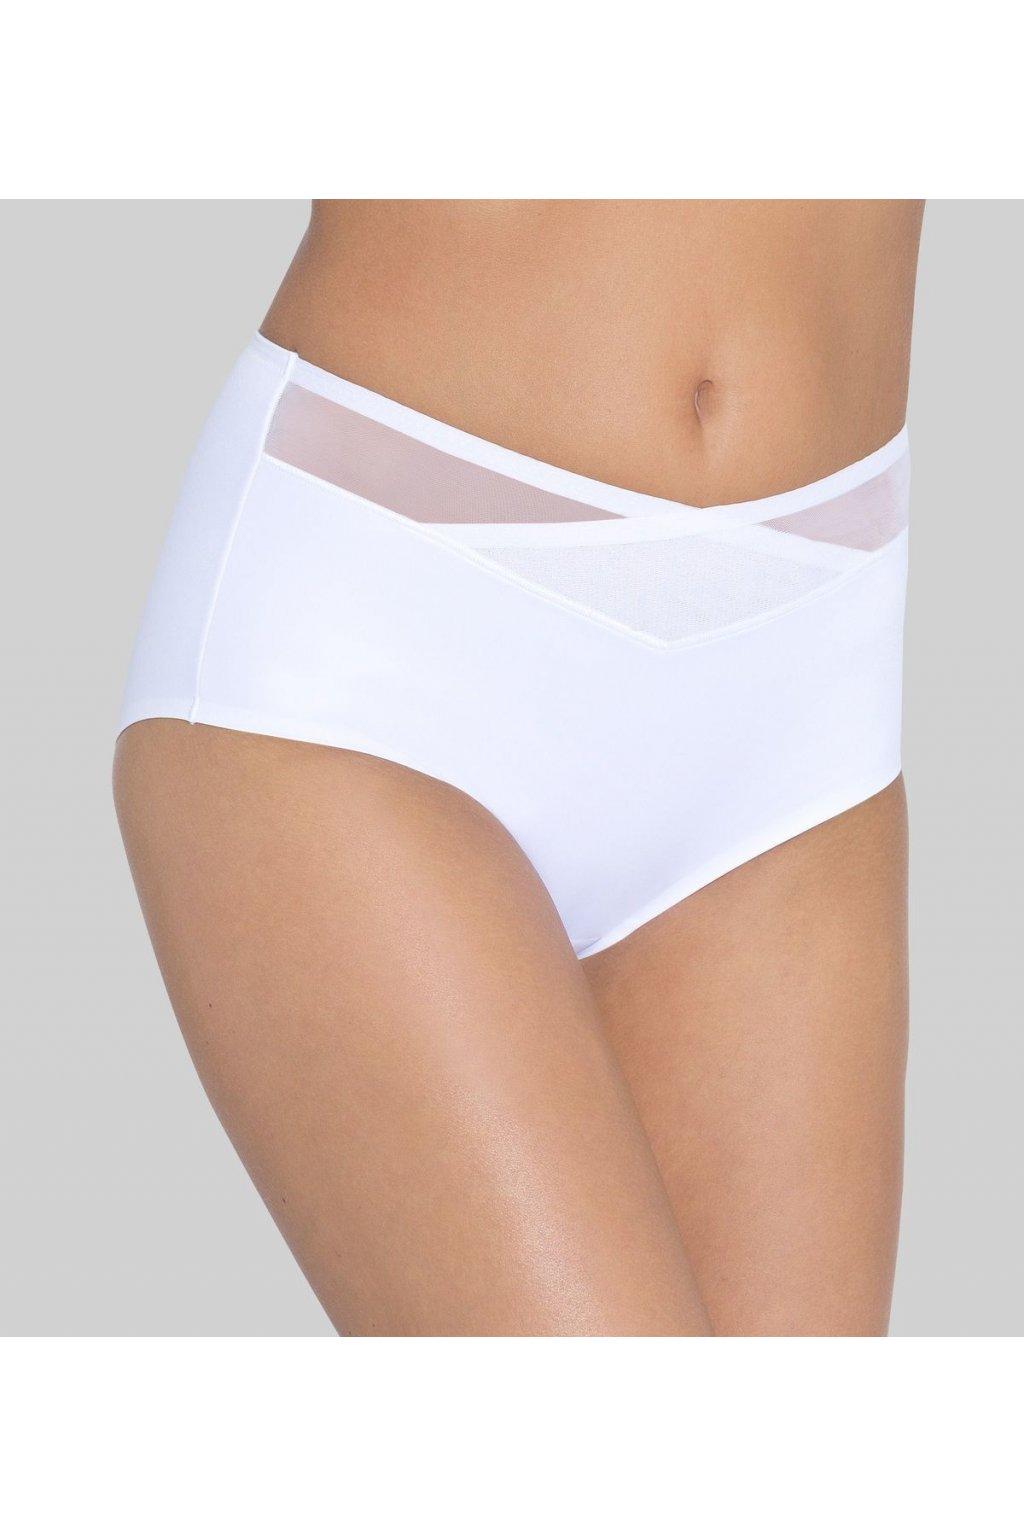 Kalhotky True Shape Sensation Maxi - Triumph